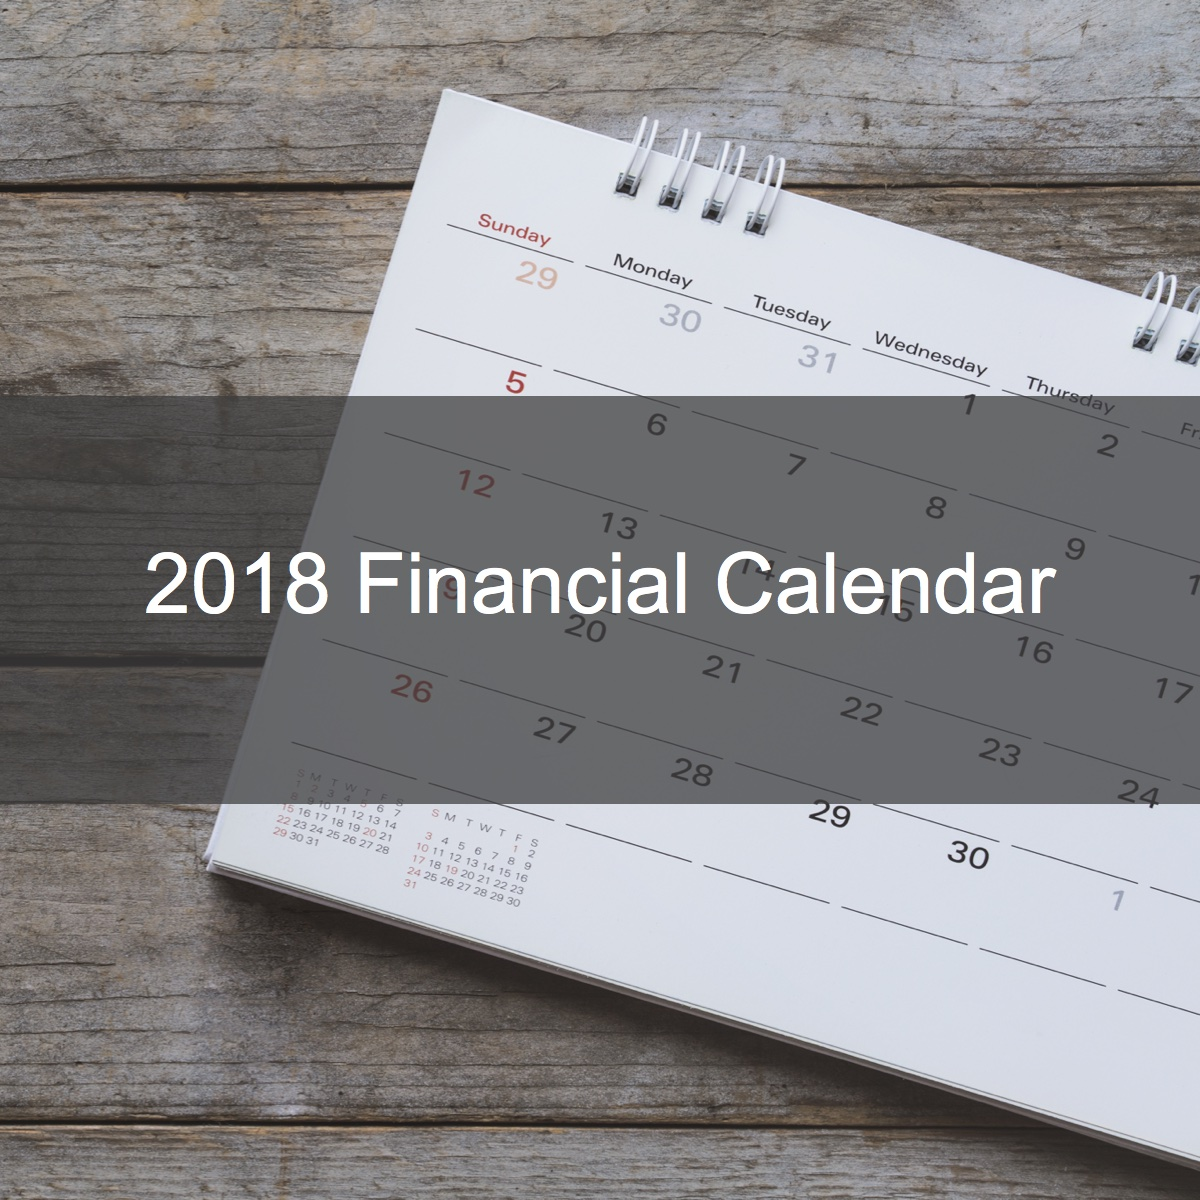 2018 Financial Calendar